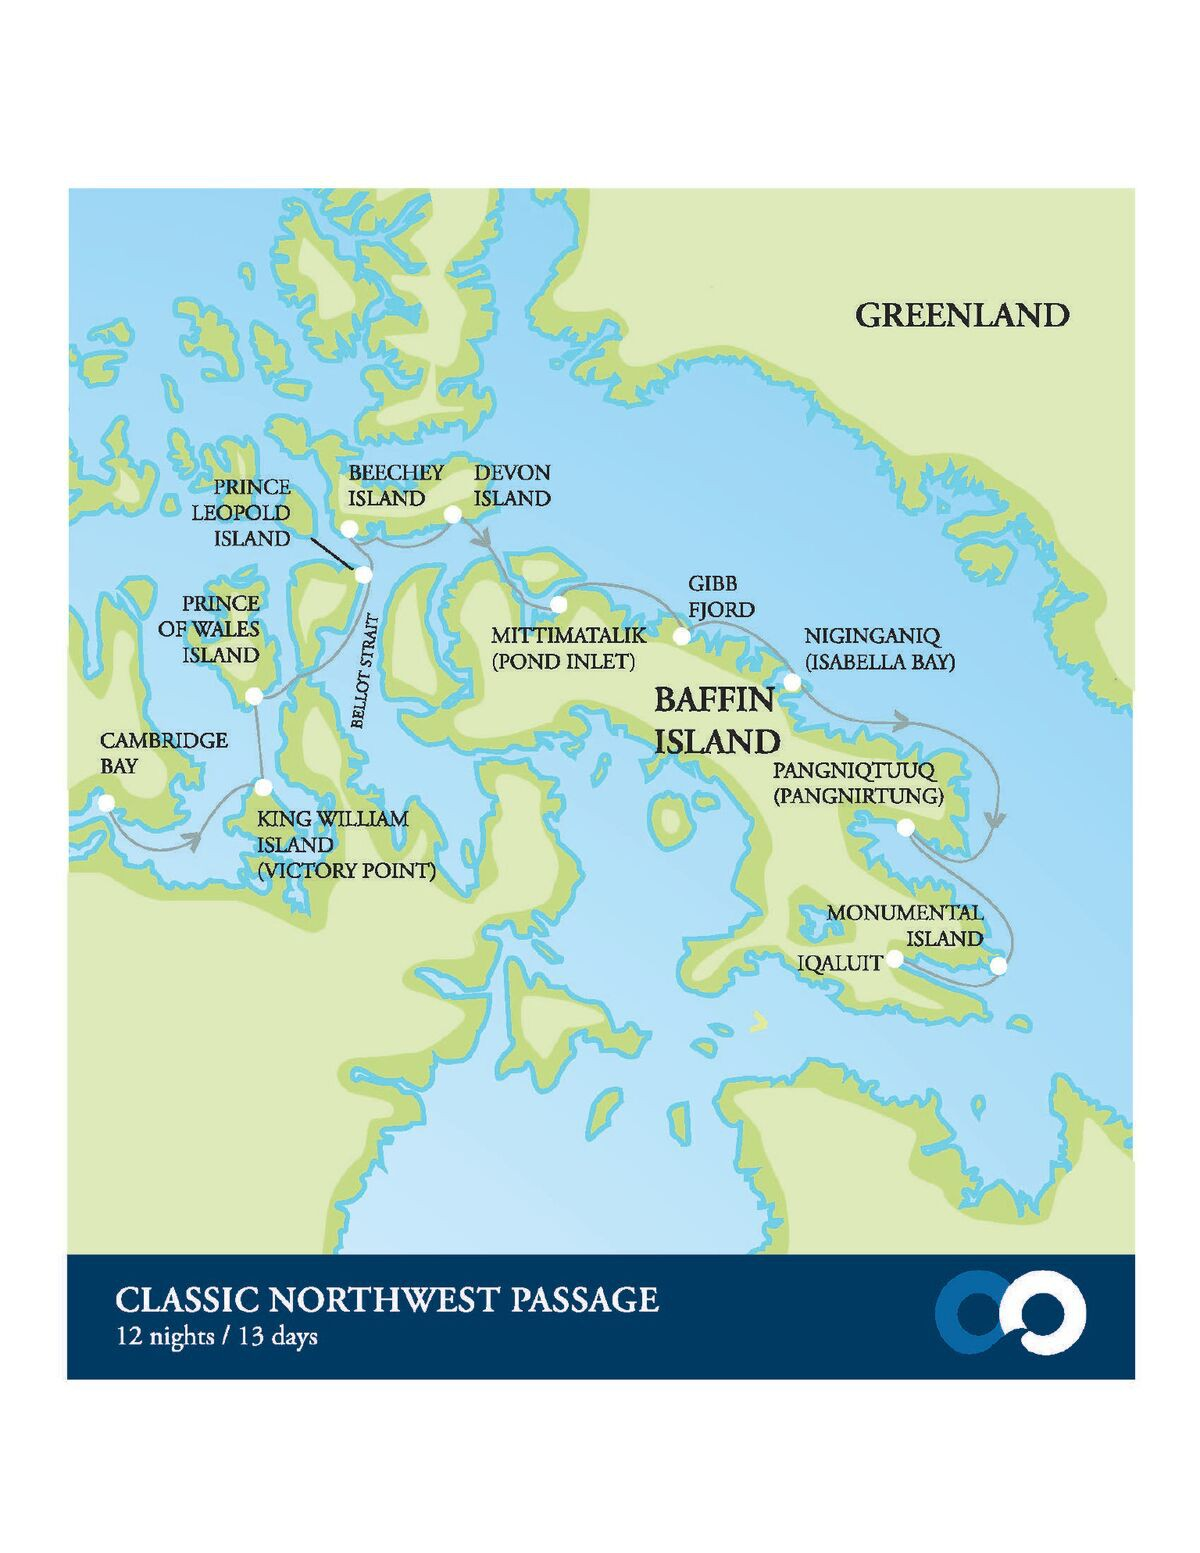 Map for Classic Northwest Passage and Baffin Island (Akademik Ioffe)